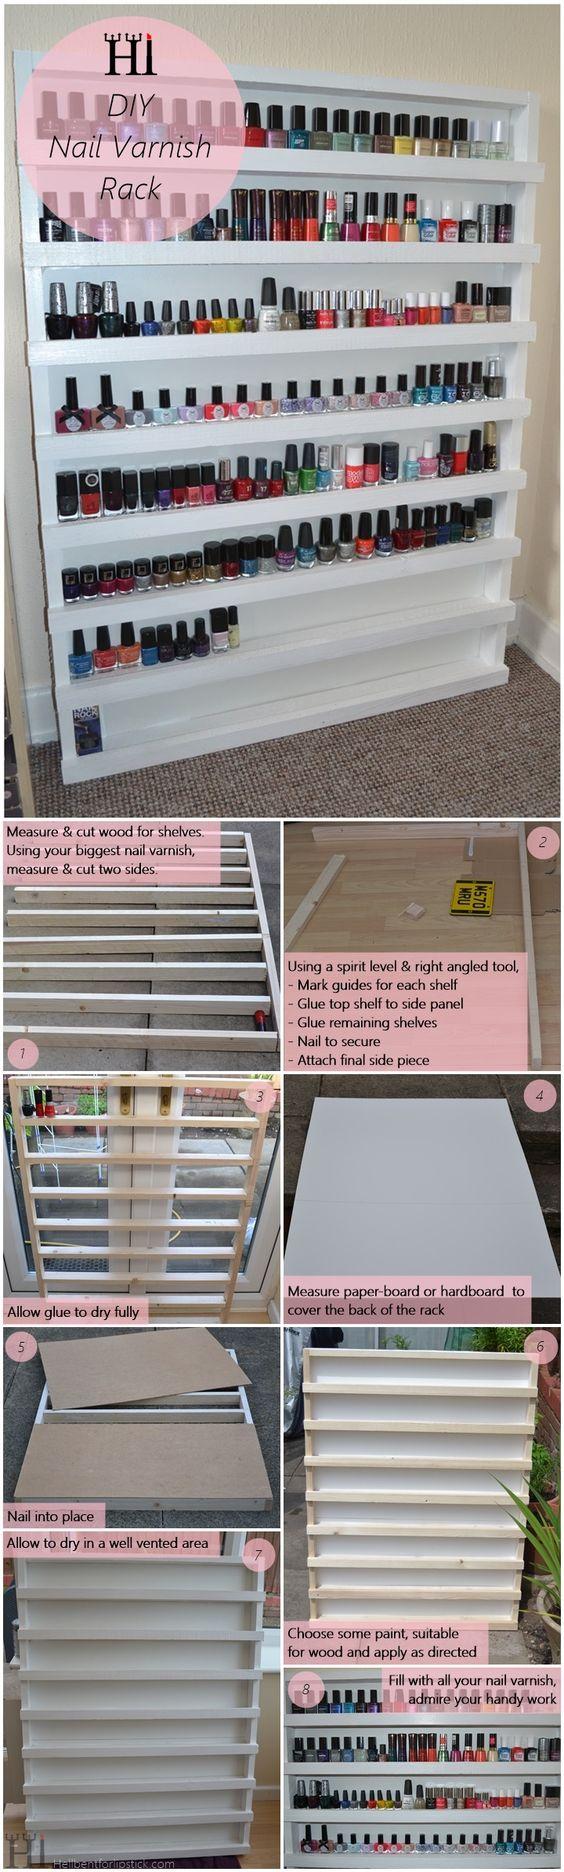 Nail Varnish Rack Storage - DIY Tutorial